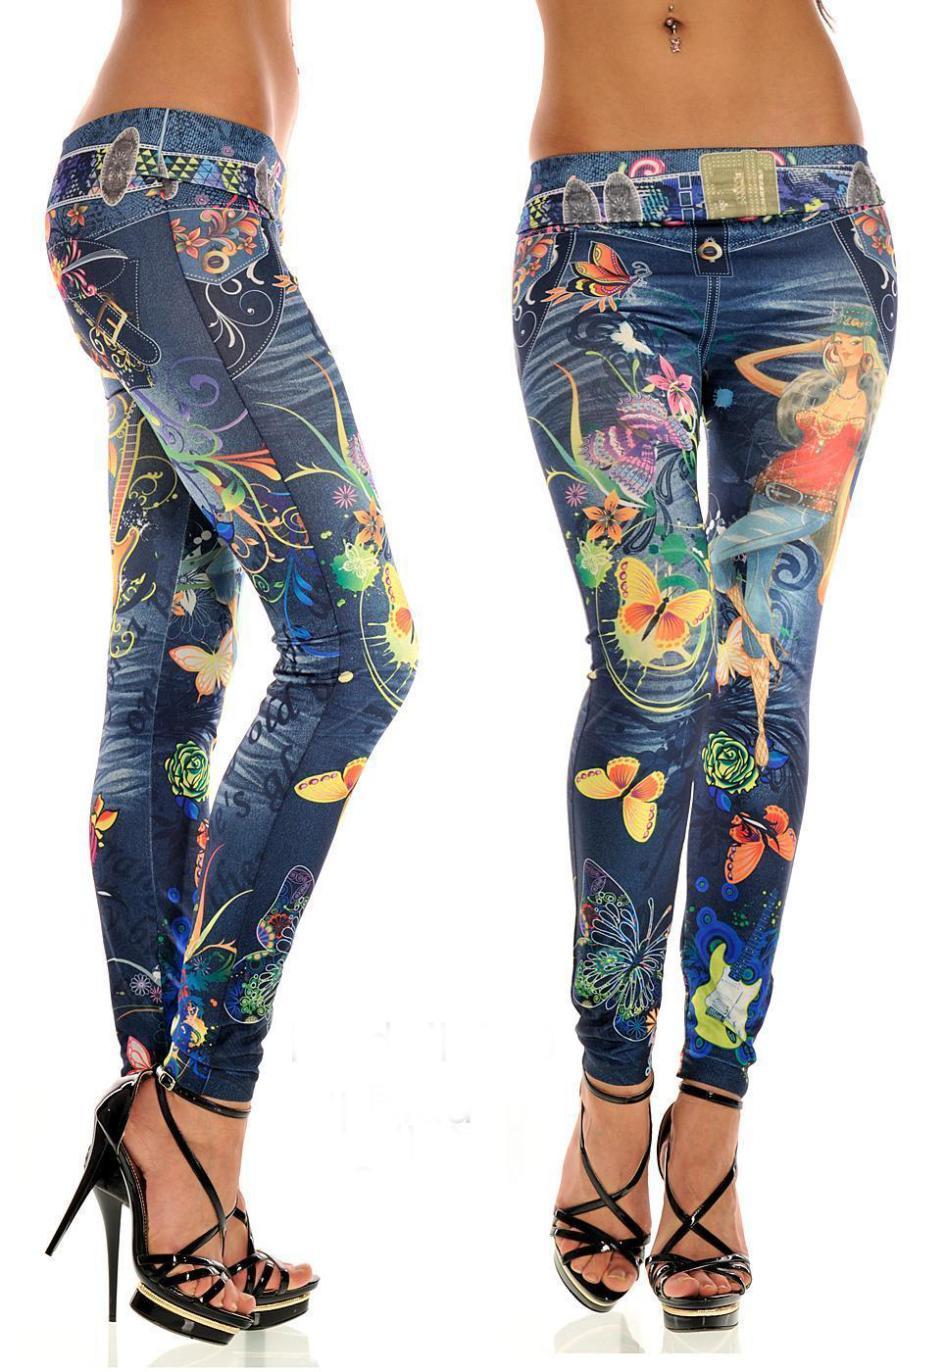 New Women Sexy Tattoo Jean Look Legging Sport Leggins Punk Fitness American Apparel Jeans Woman Pants 9052(China (Mainland))